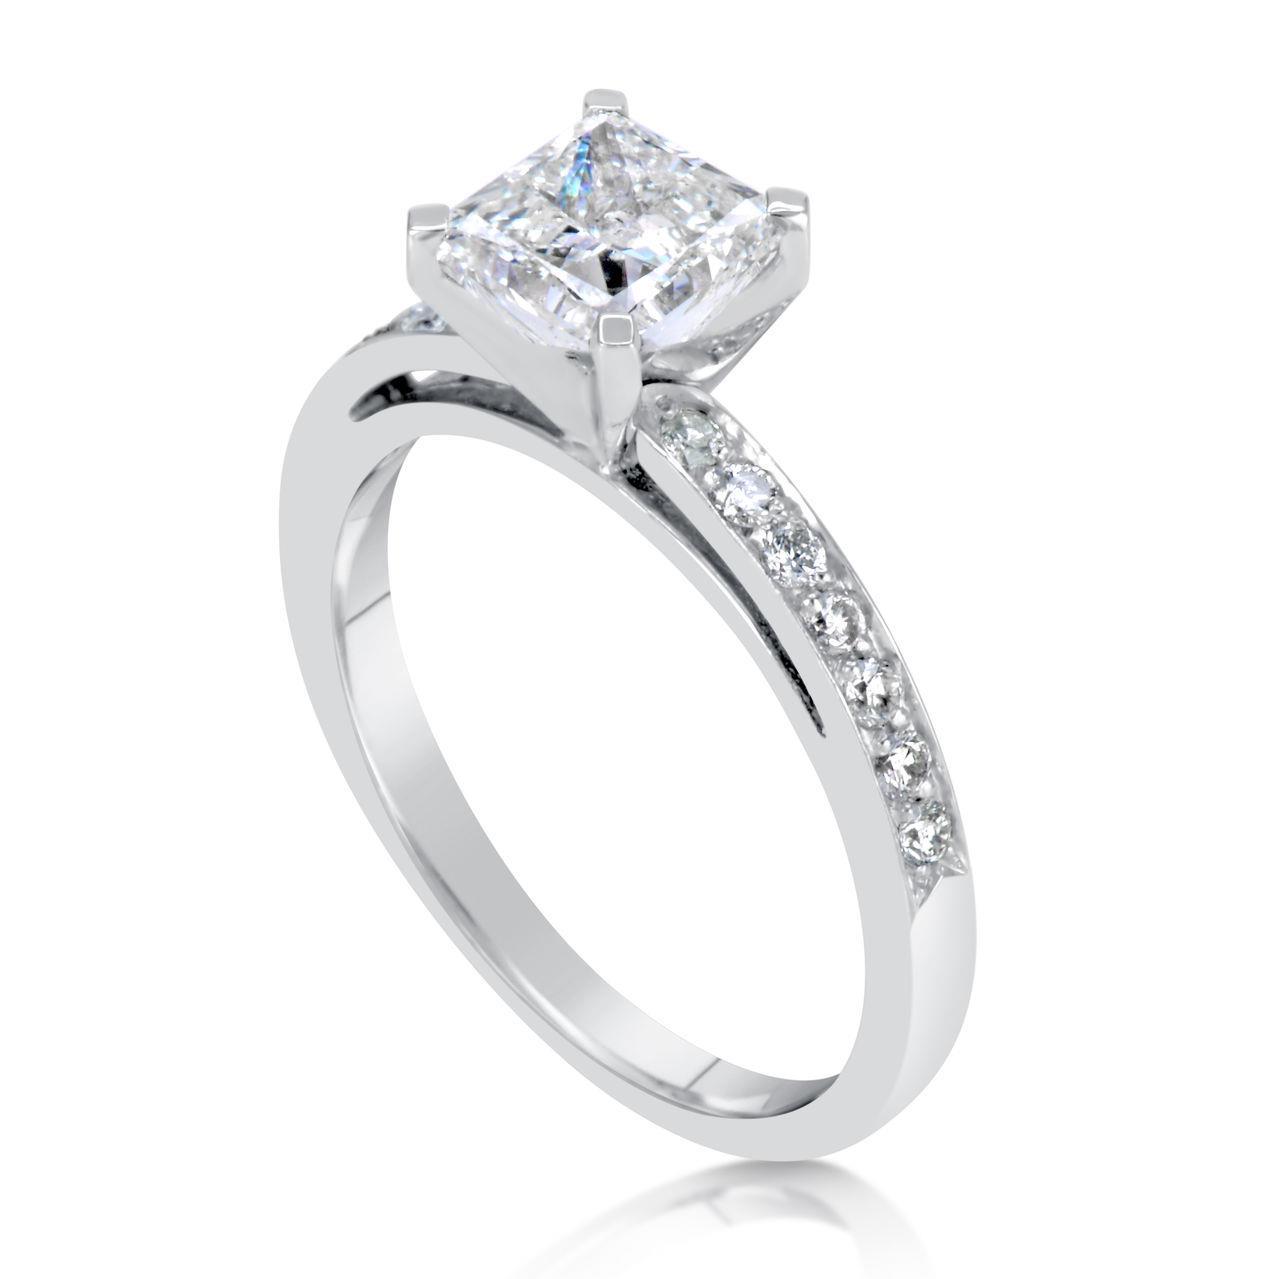 1 5 ct princess cut d vs2 engagement ring 14k